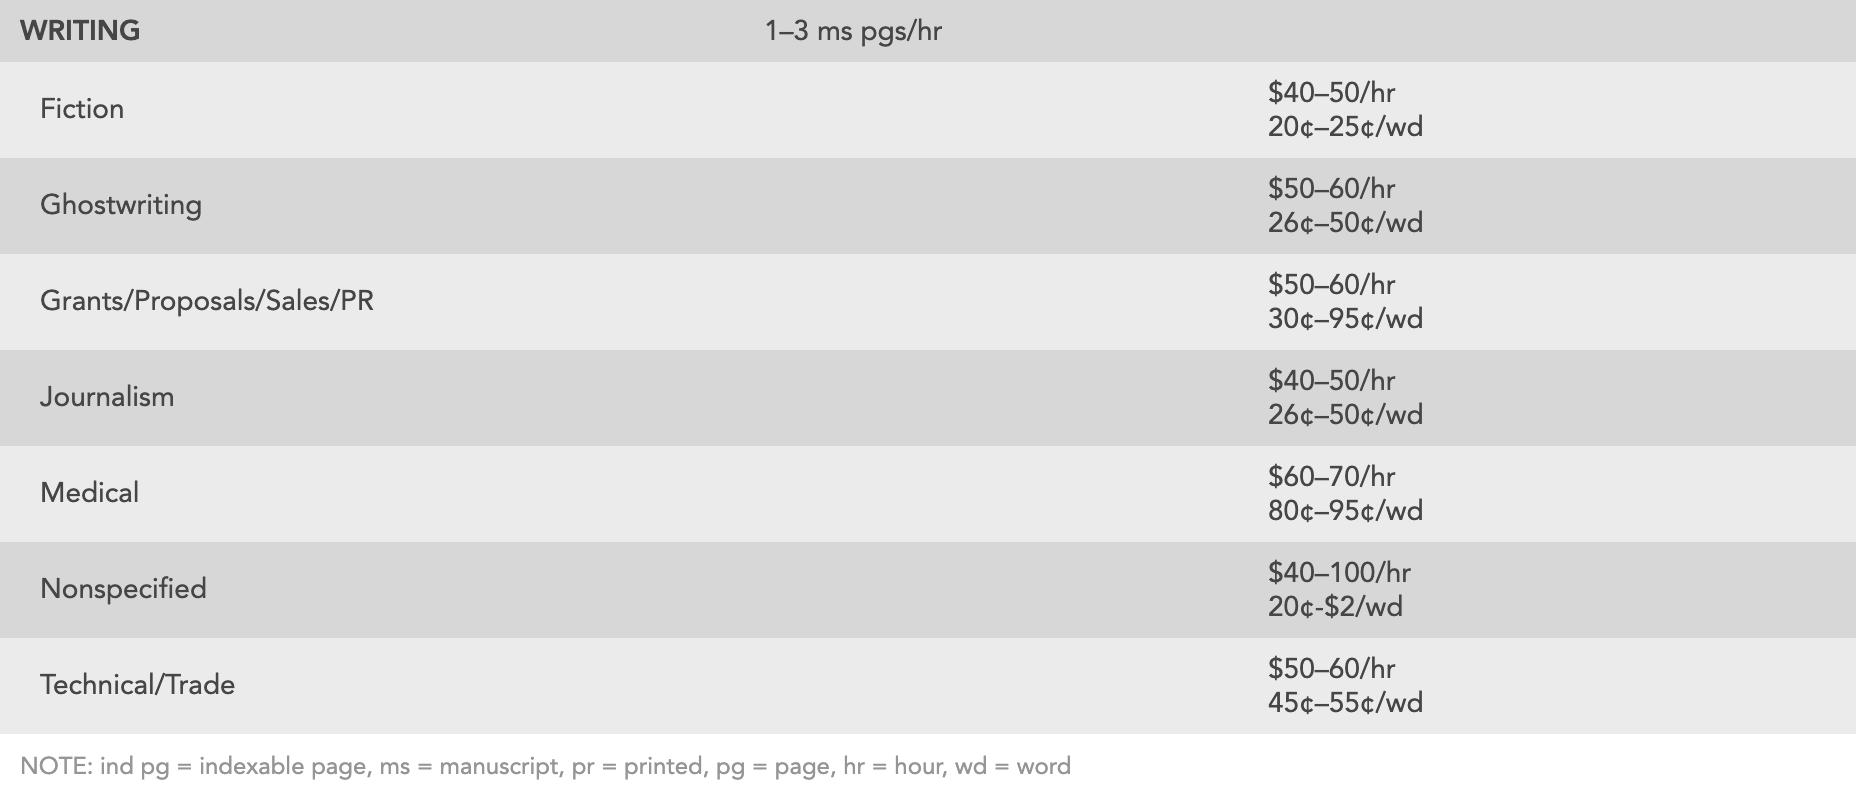 Rates on freelance writing jobs